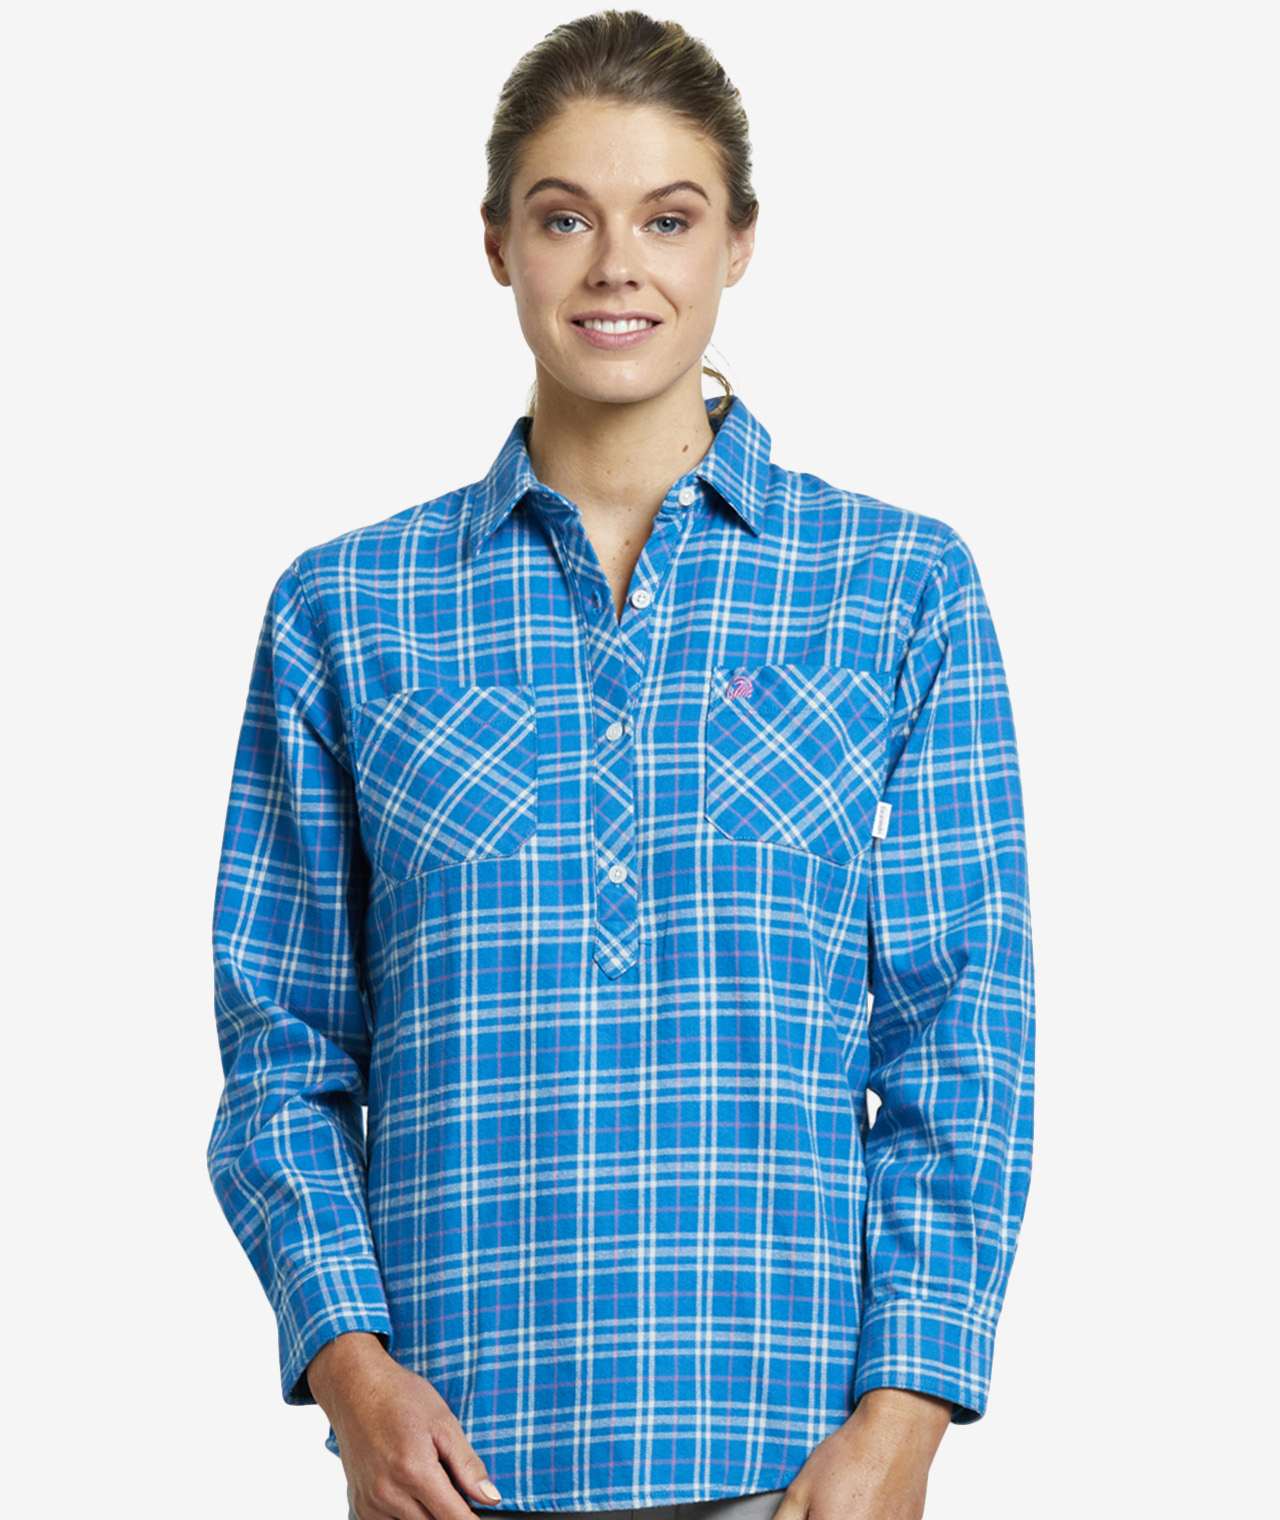 Swanndri Women's Barn Cotton Check Work Shirt in Teal Check